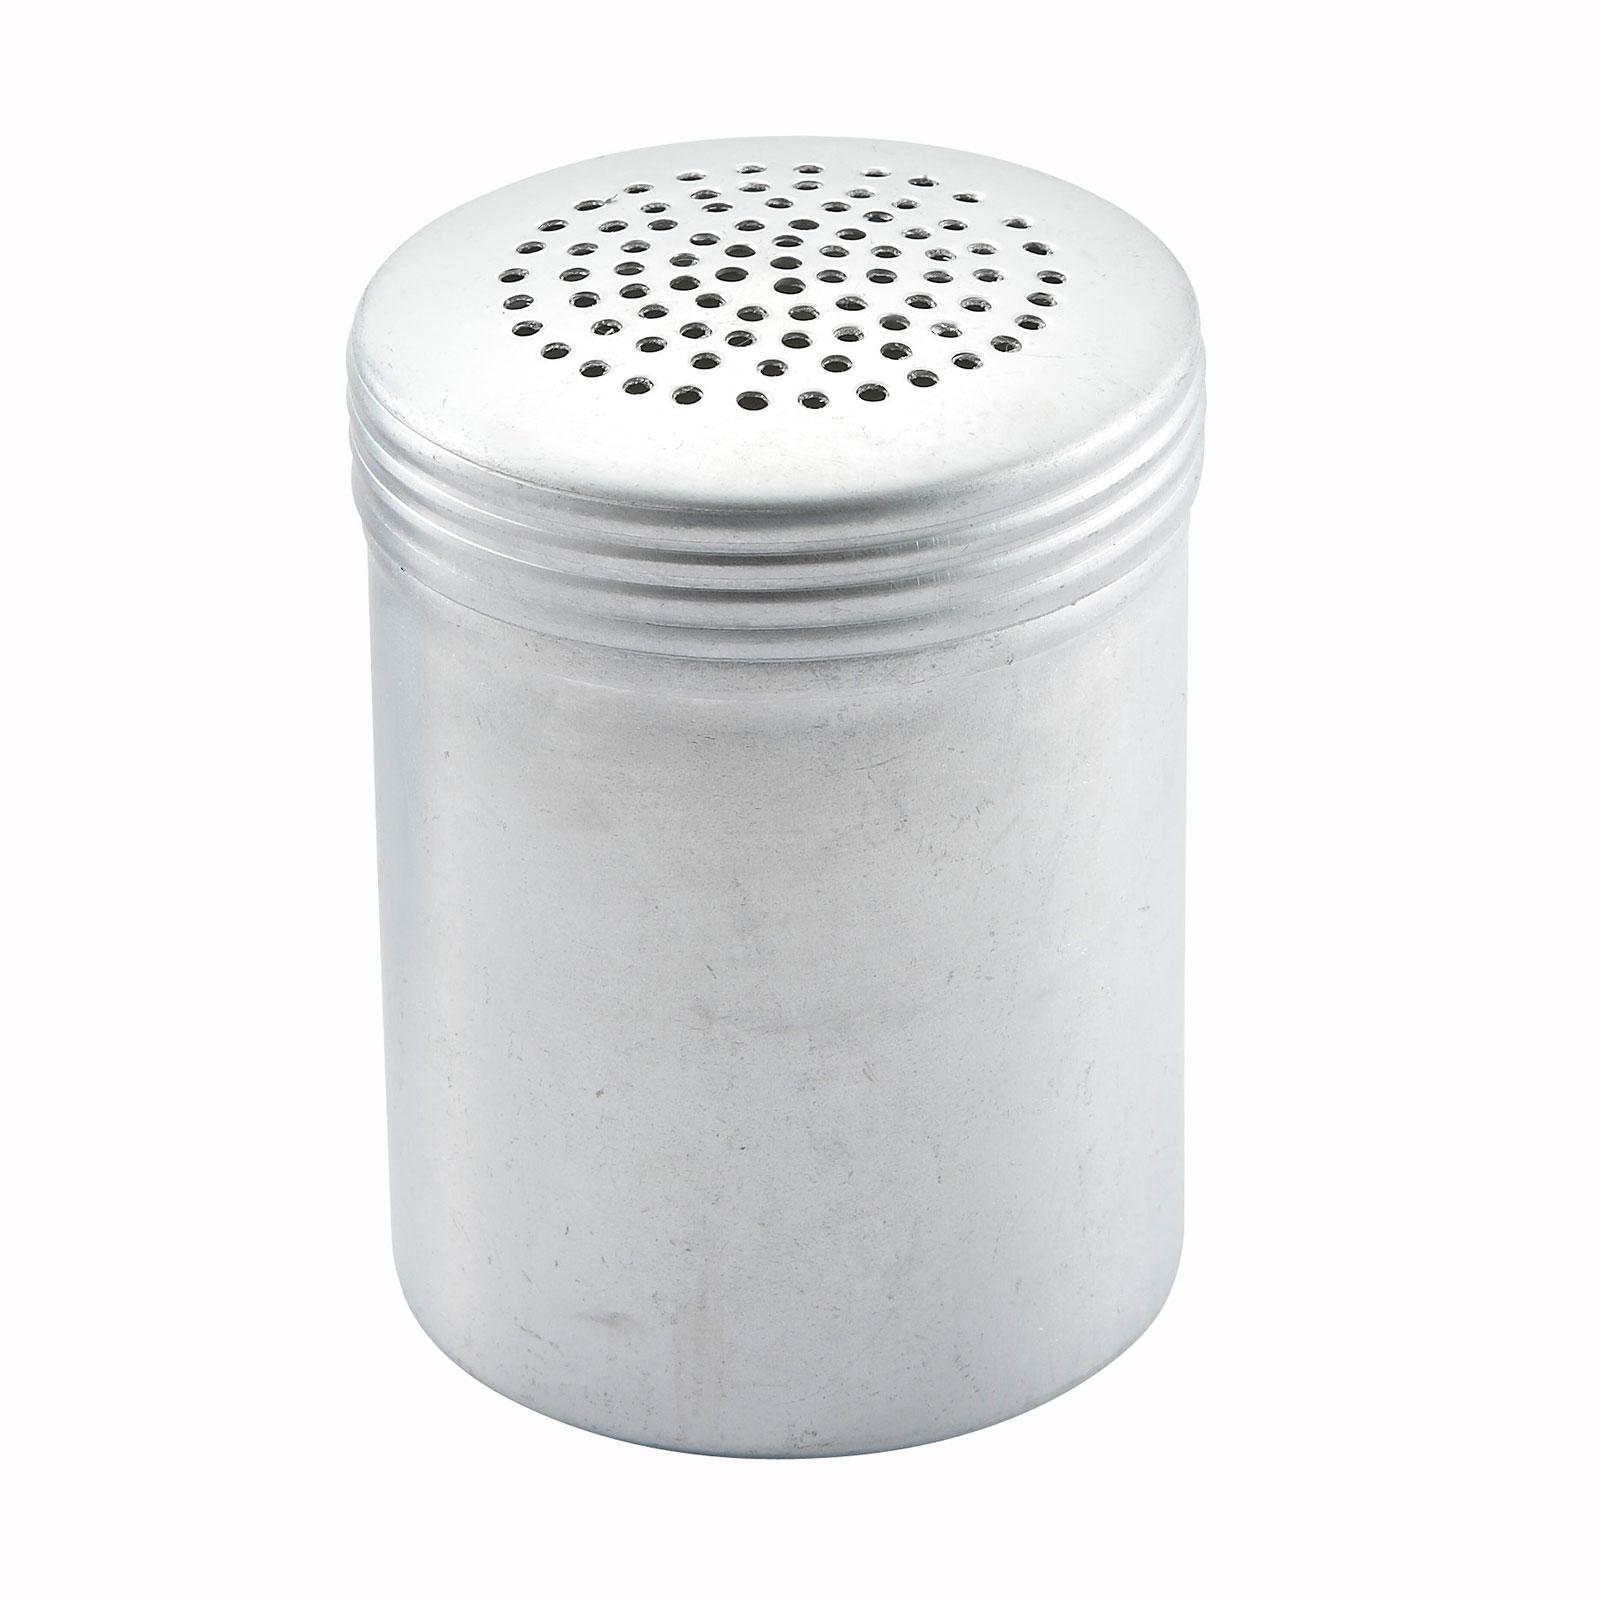 Winco ADRG-10H shaker / dredge